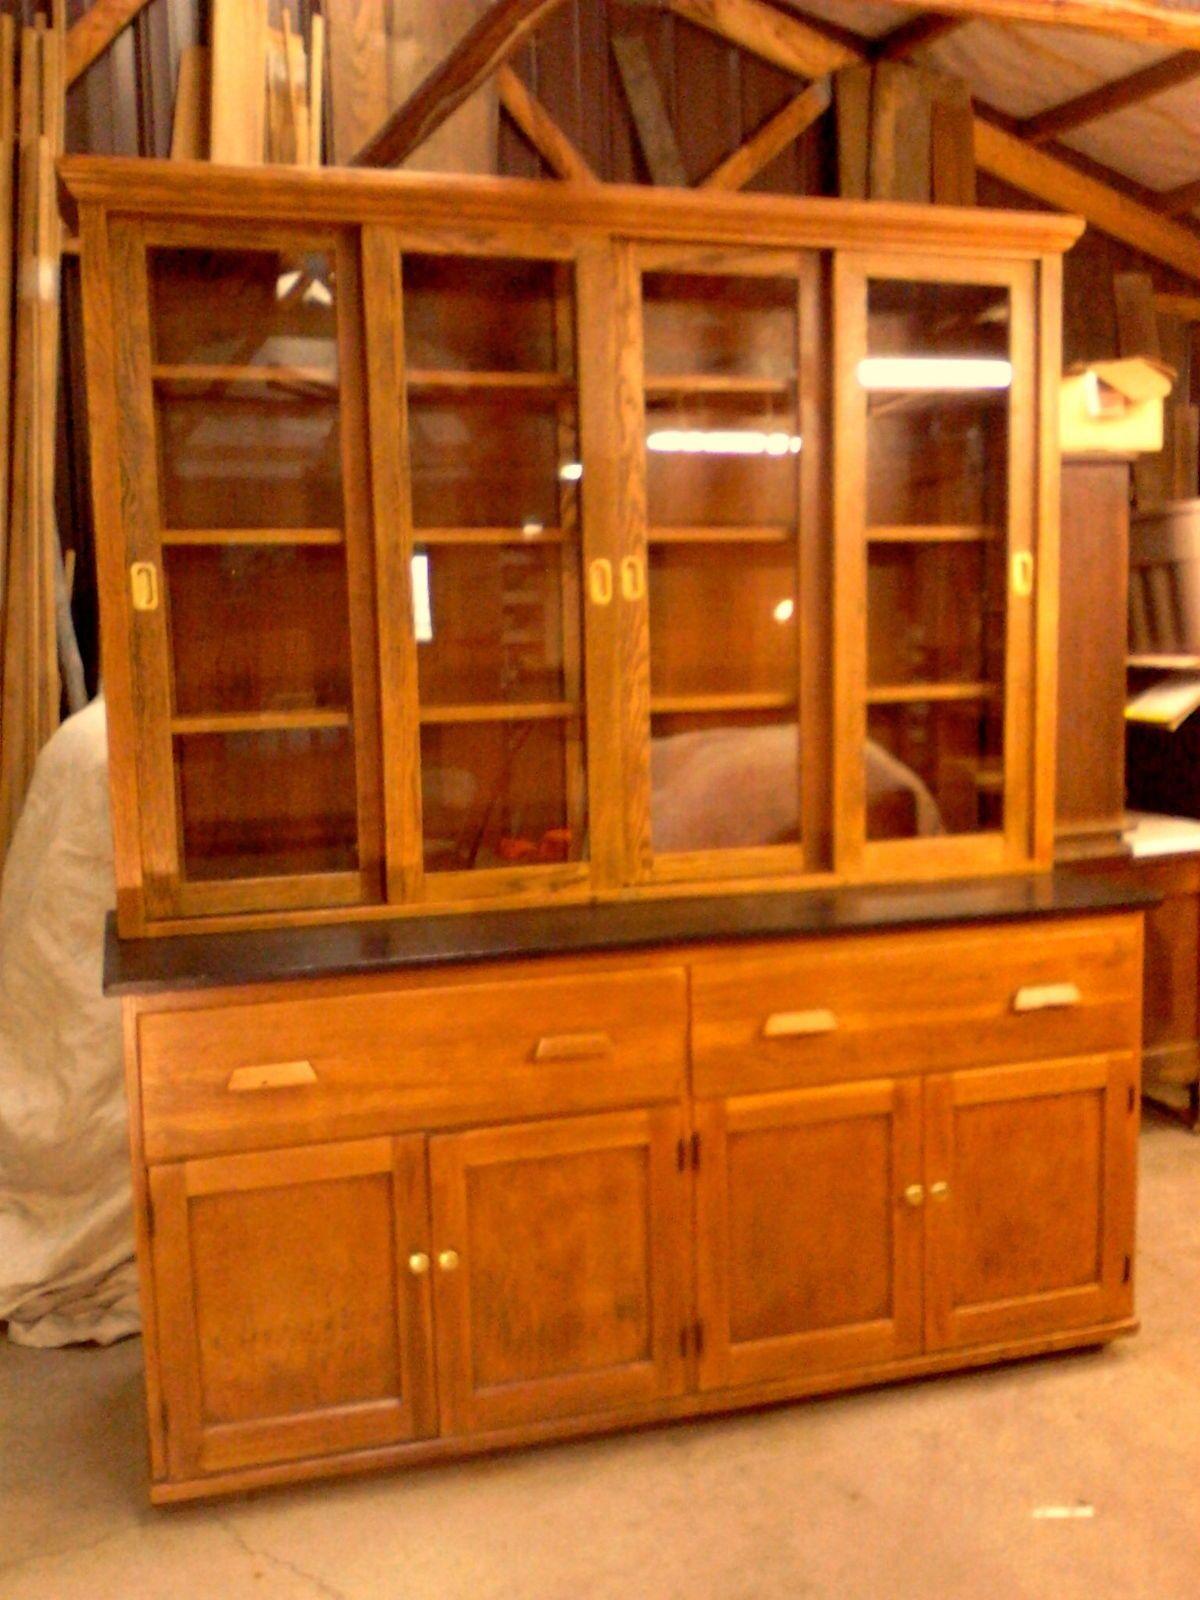 Antique arts and crafts furniture - Antique Oak School Science Lab Cabinet Kitchen Display Bookcase Circa 1920